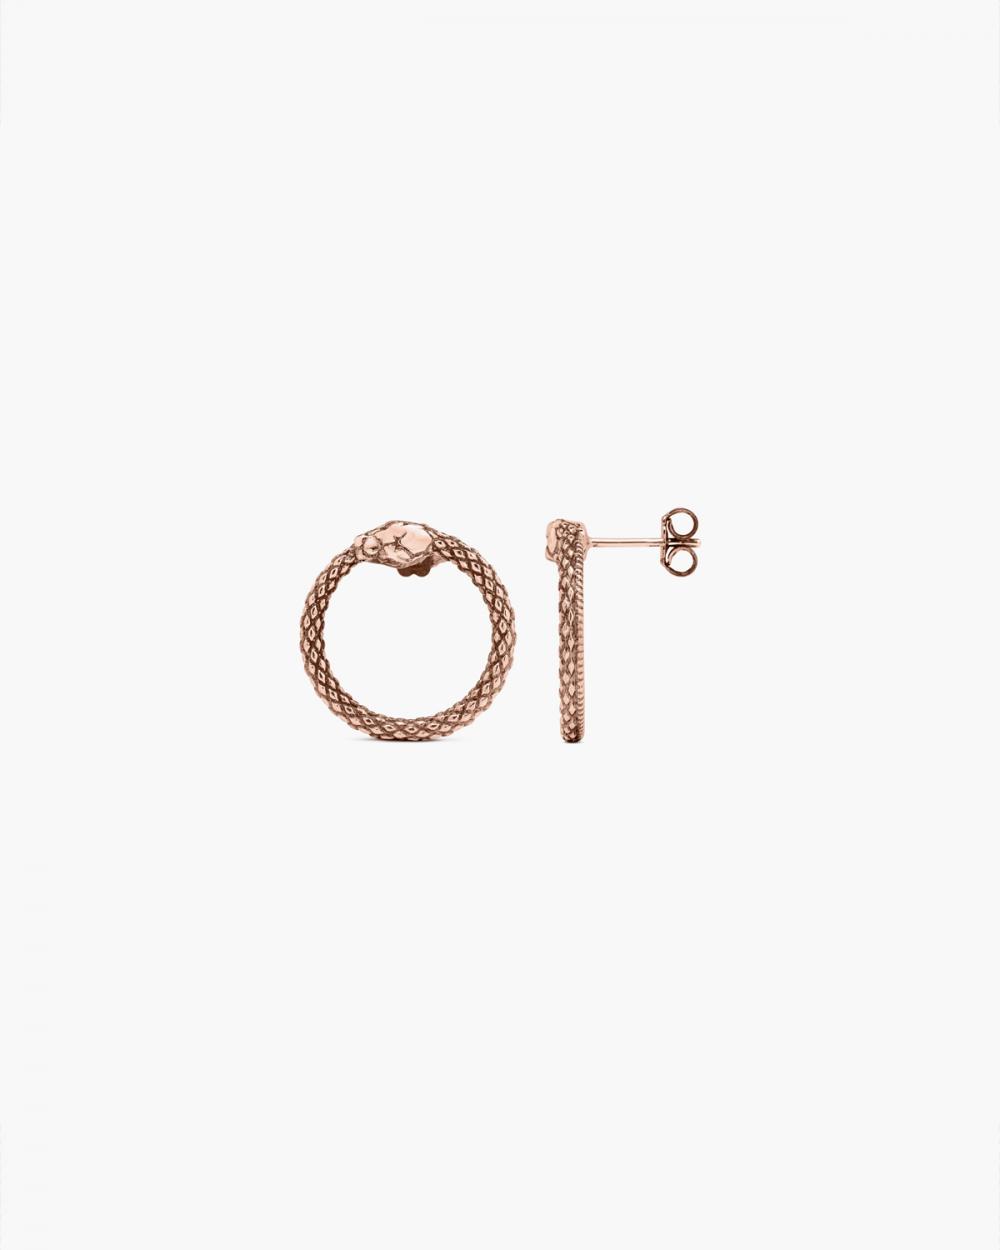 Earrings PINK GOLD OUROBOROS PAIR EARRINGS NOVE25